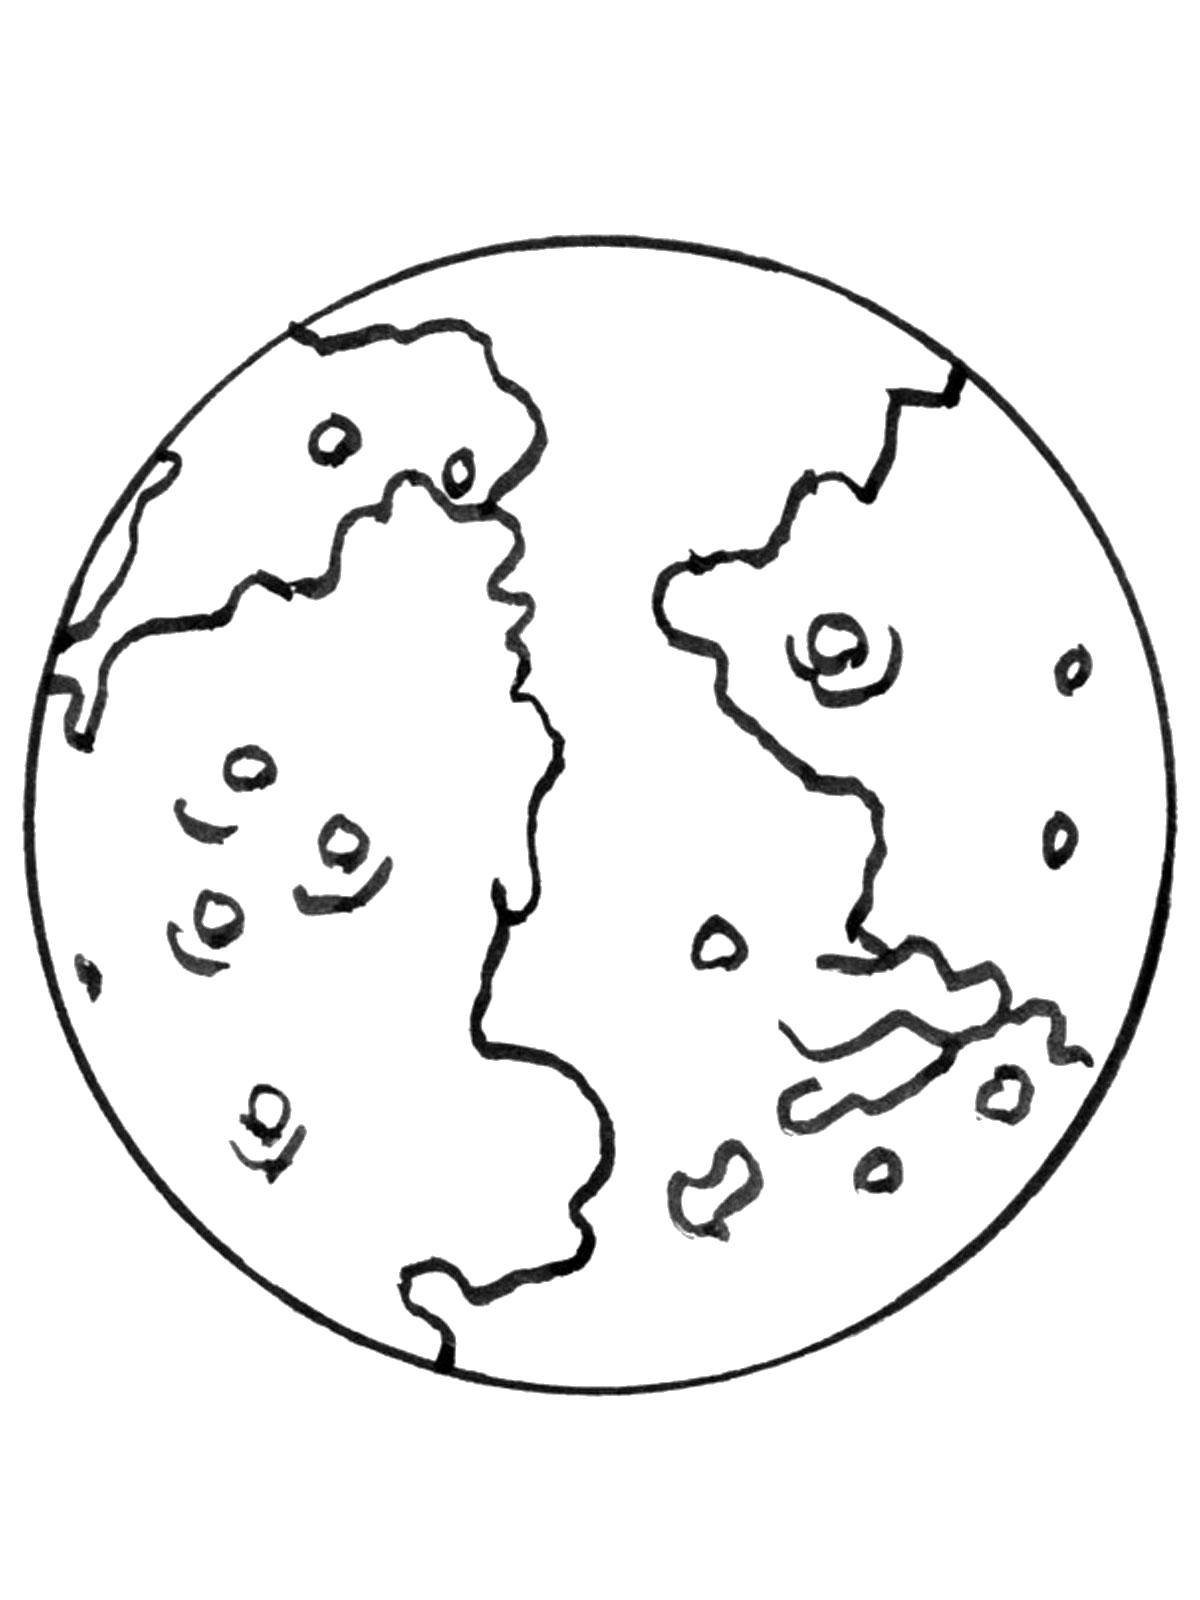 «Раскраски Космос, Раскраска Планета космос.» — карточка ...